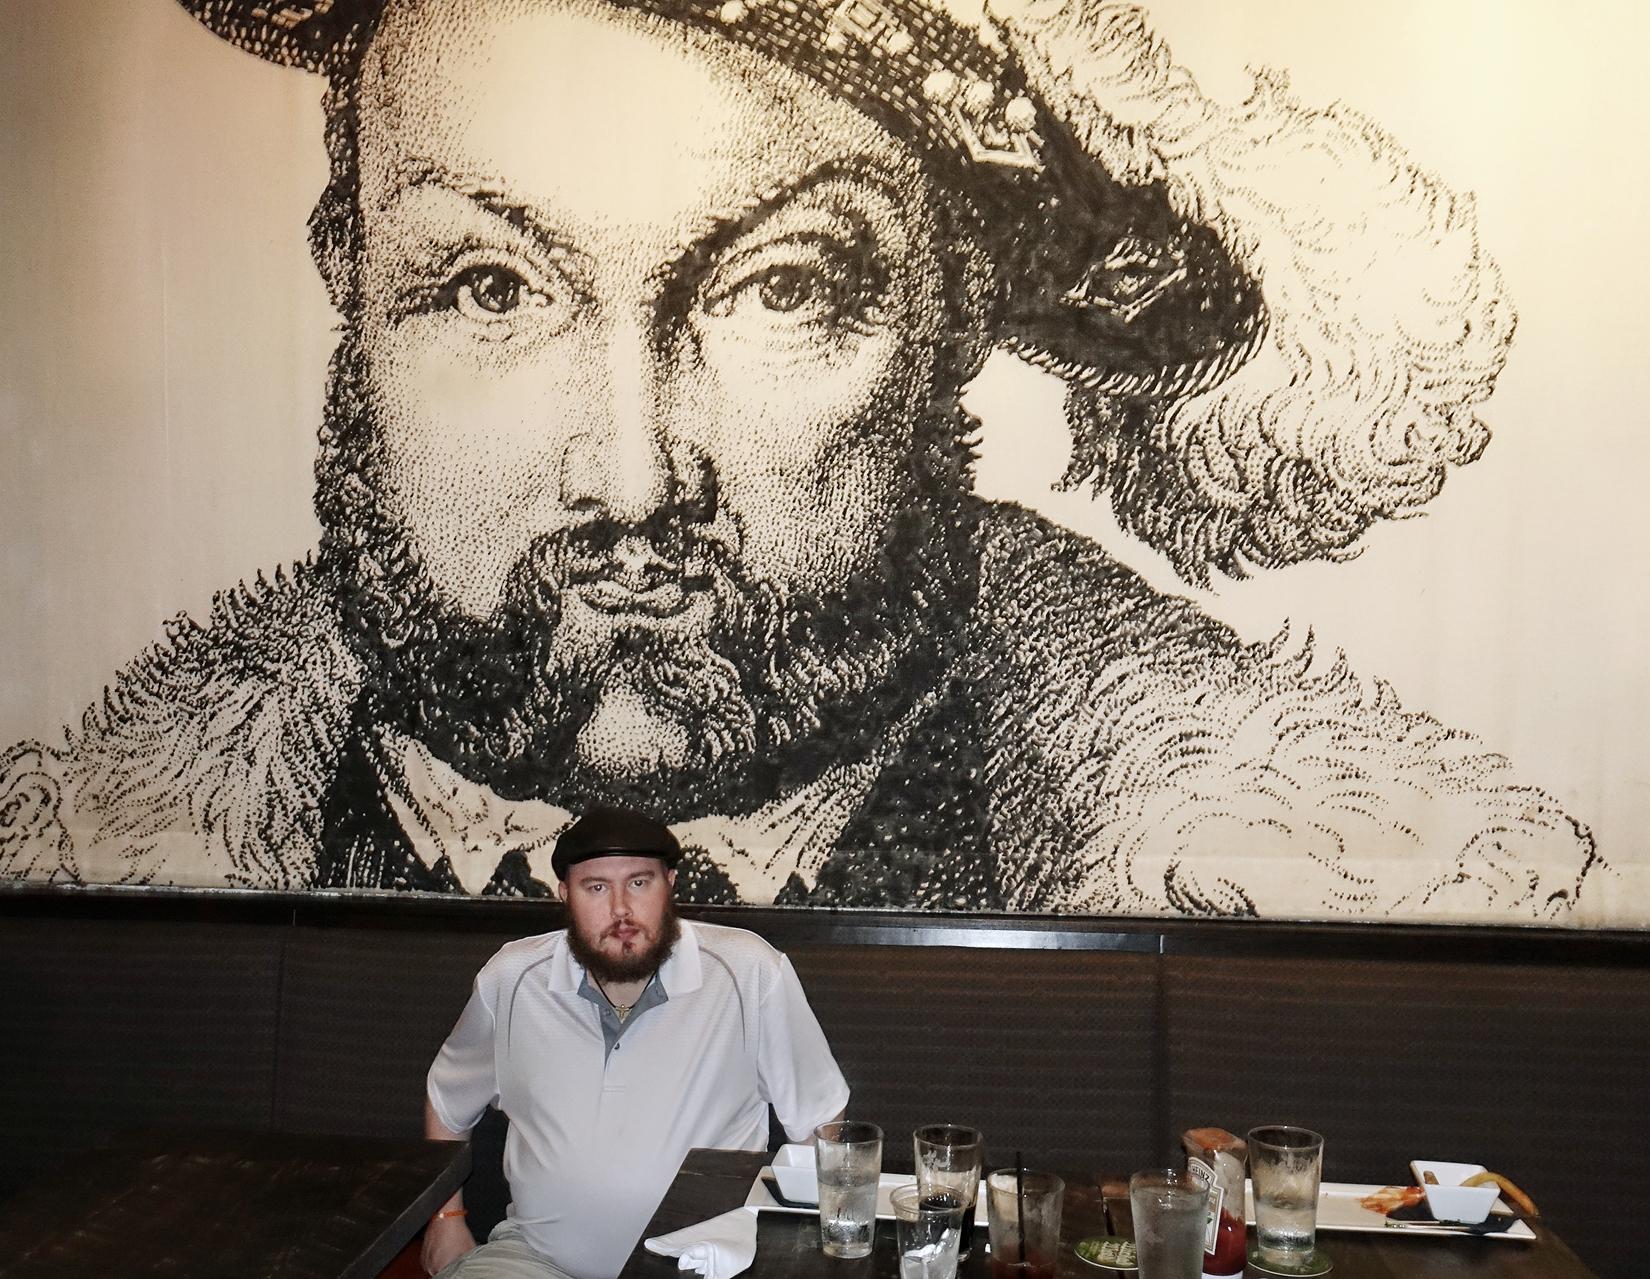 Henry VIII look-alike, Asheville, NC